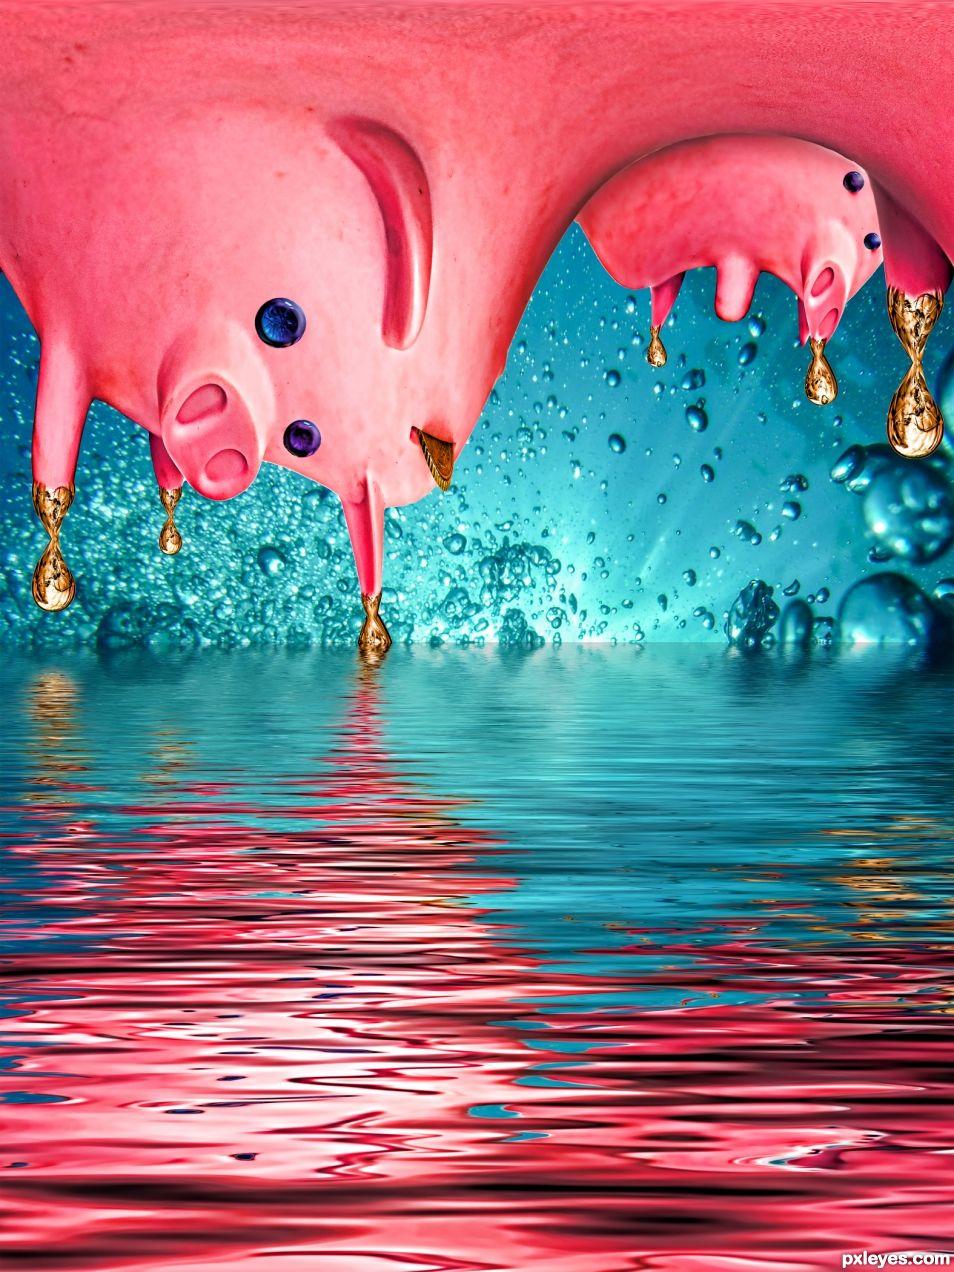 Drippy Pig Drippy Drippy Pig